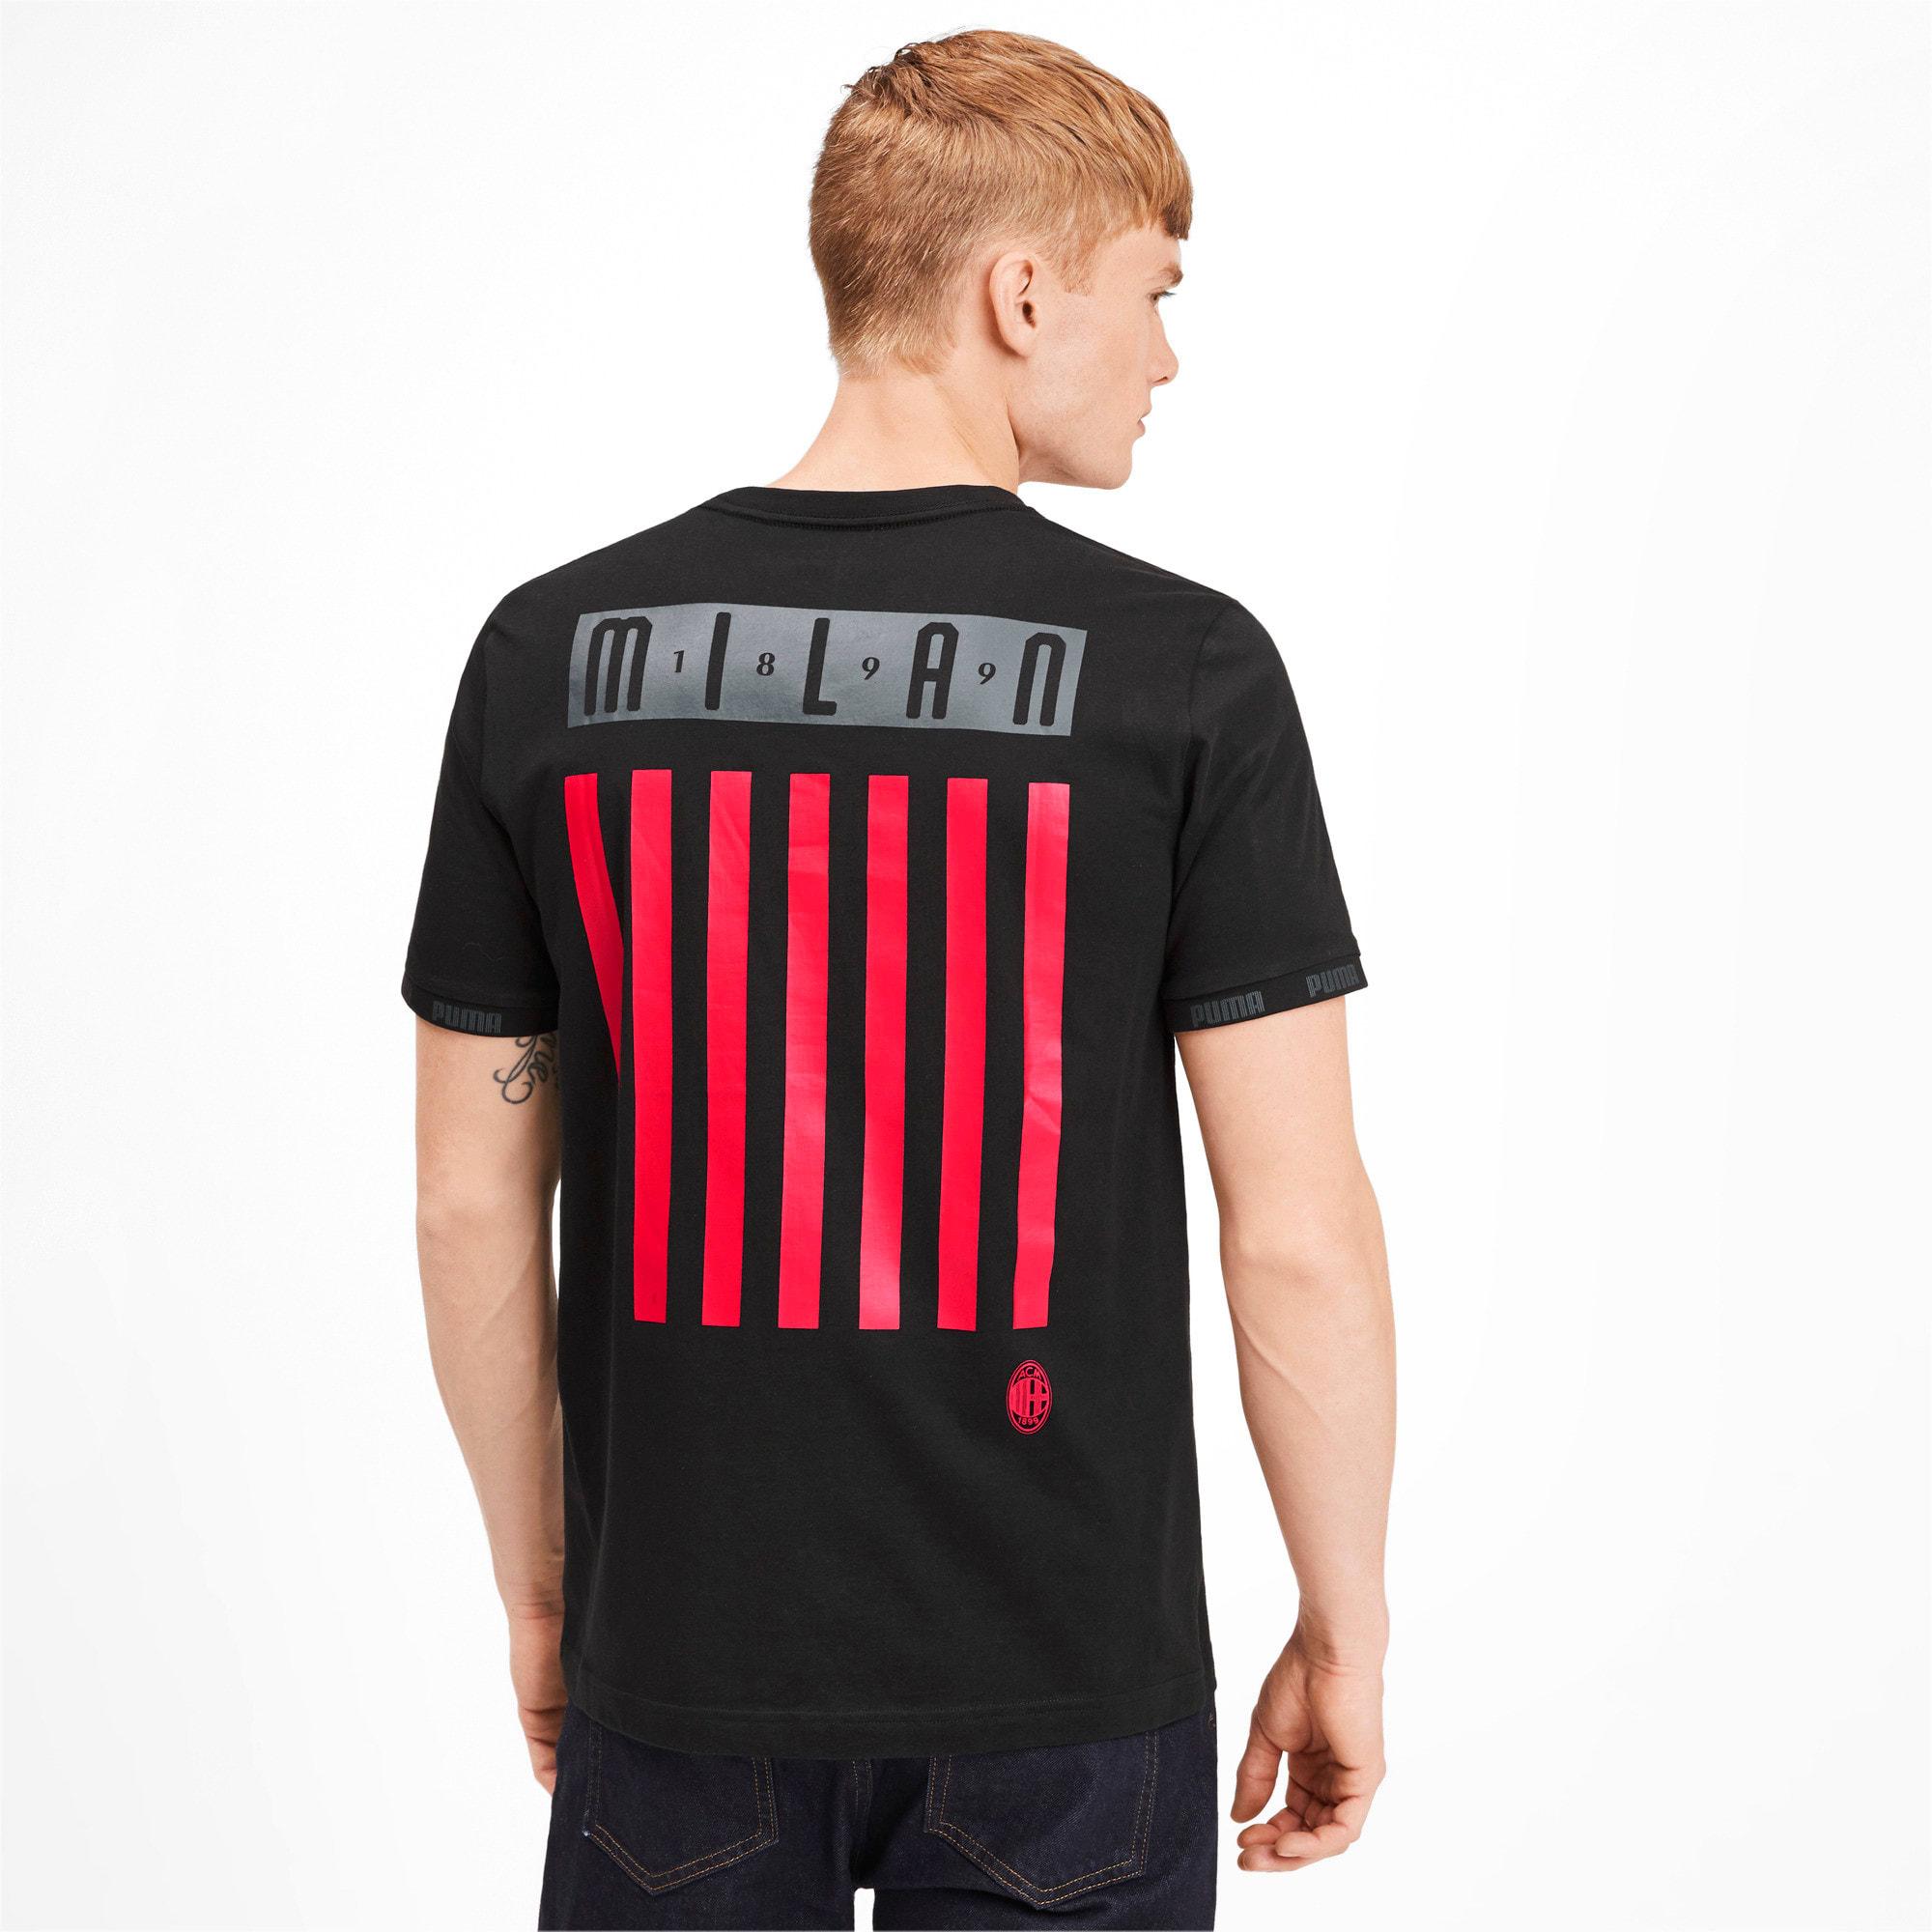 Thumbnail 2 of AC Milan Men's Football Culture Tee, Cotton Black-tango red, medium